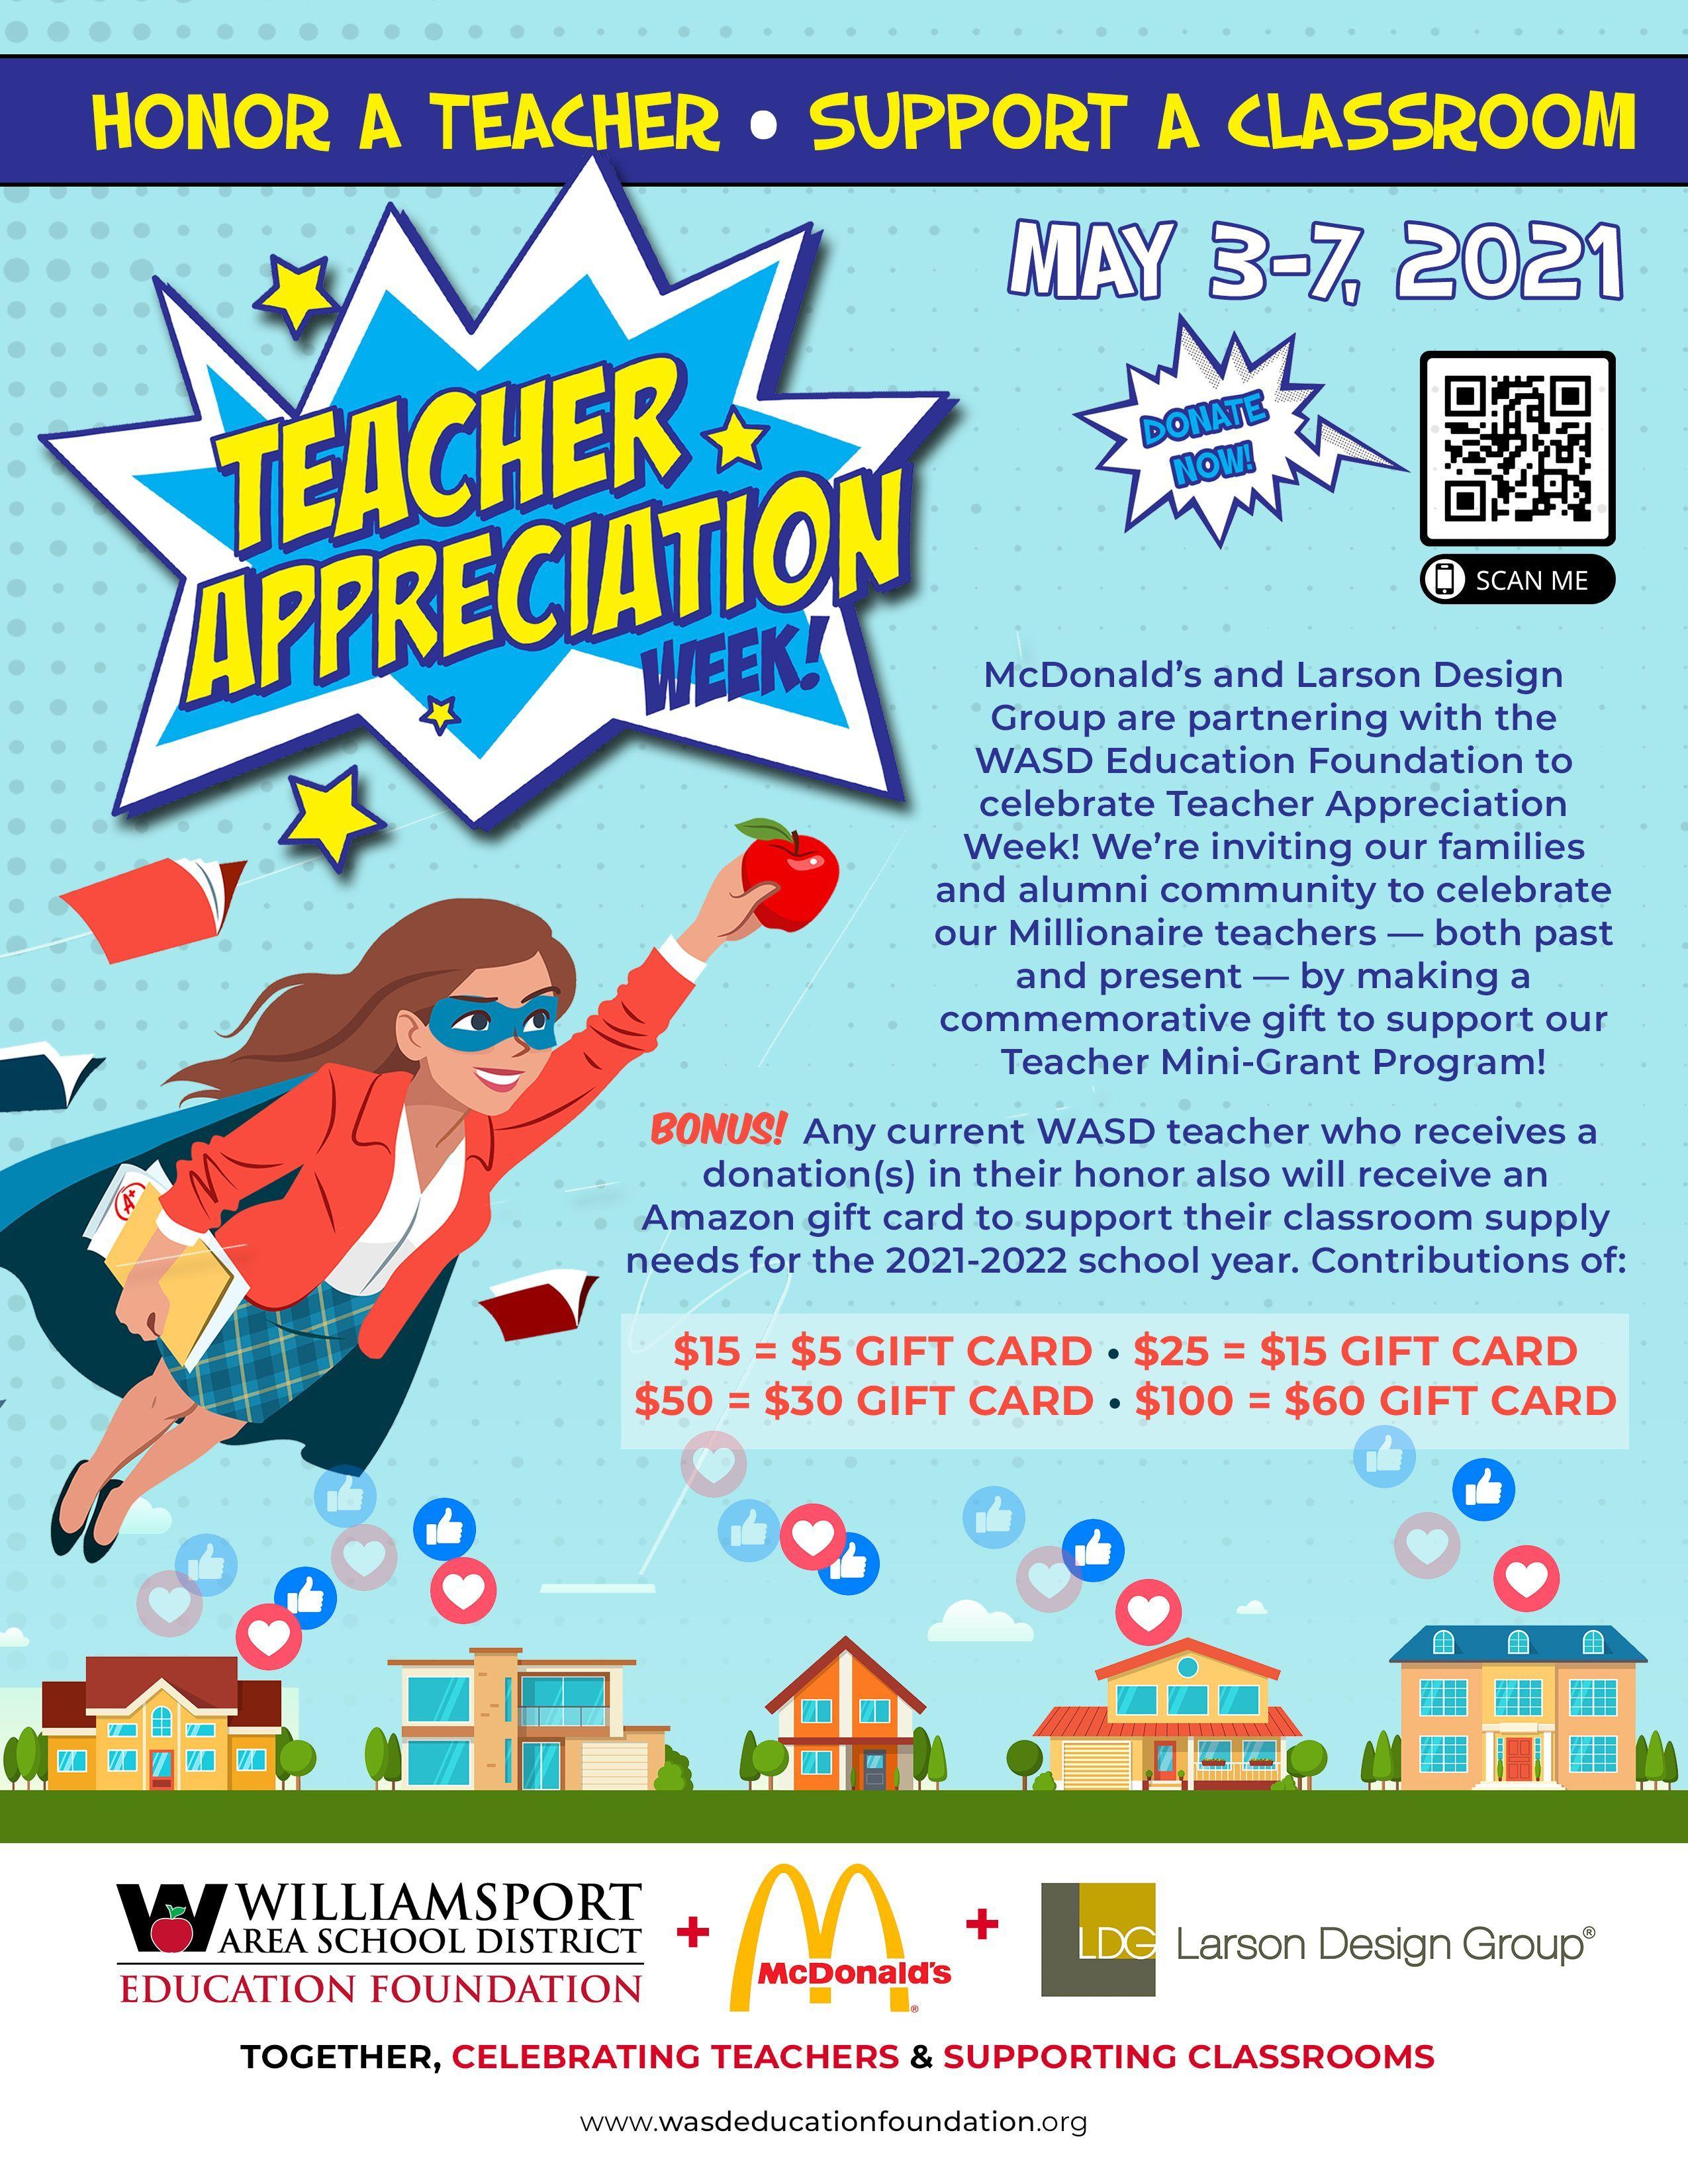 McDonald's, Larson Design Group Partner with WASDEF to Celebrate Teacher Appreciation Week